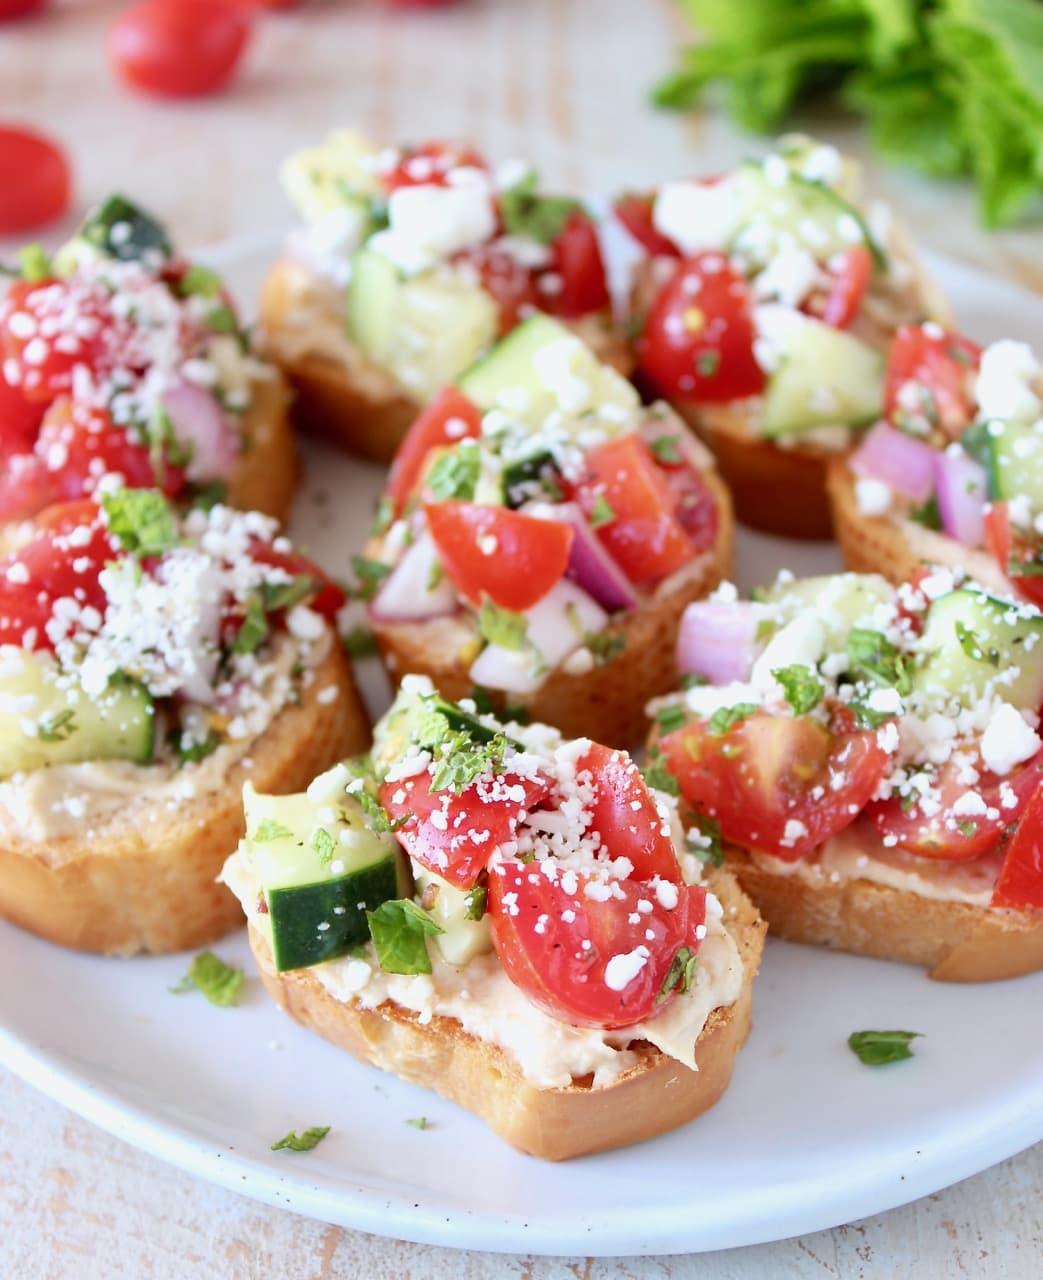 Greek Bruschetta - Tomato Cucumber, Hummus and Feta Cheese on Toasted Baguettes